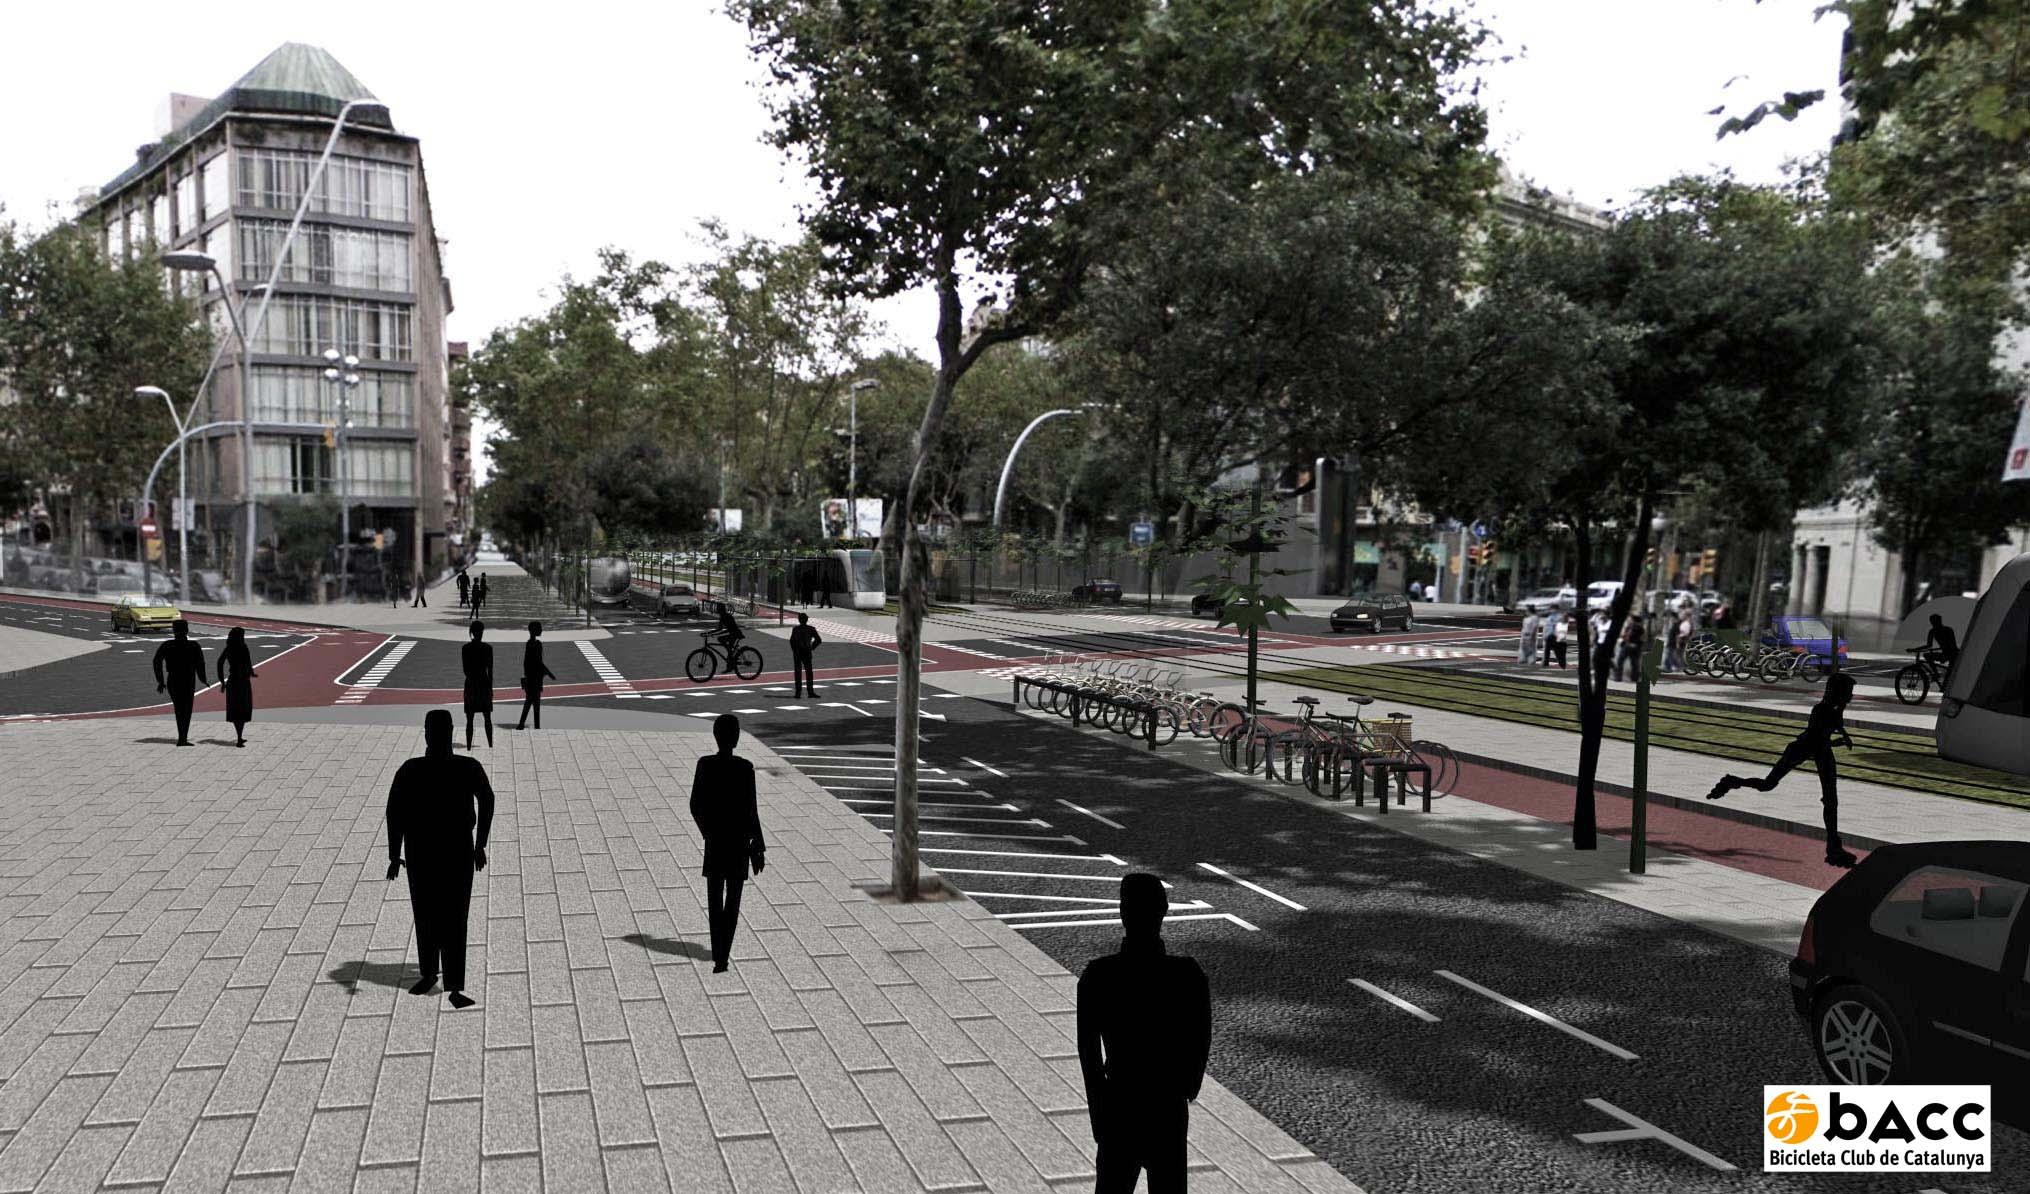 Diagonal Fotomontage